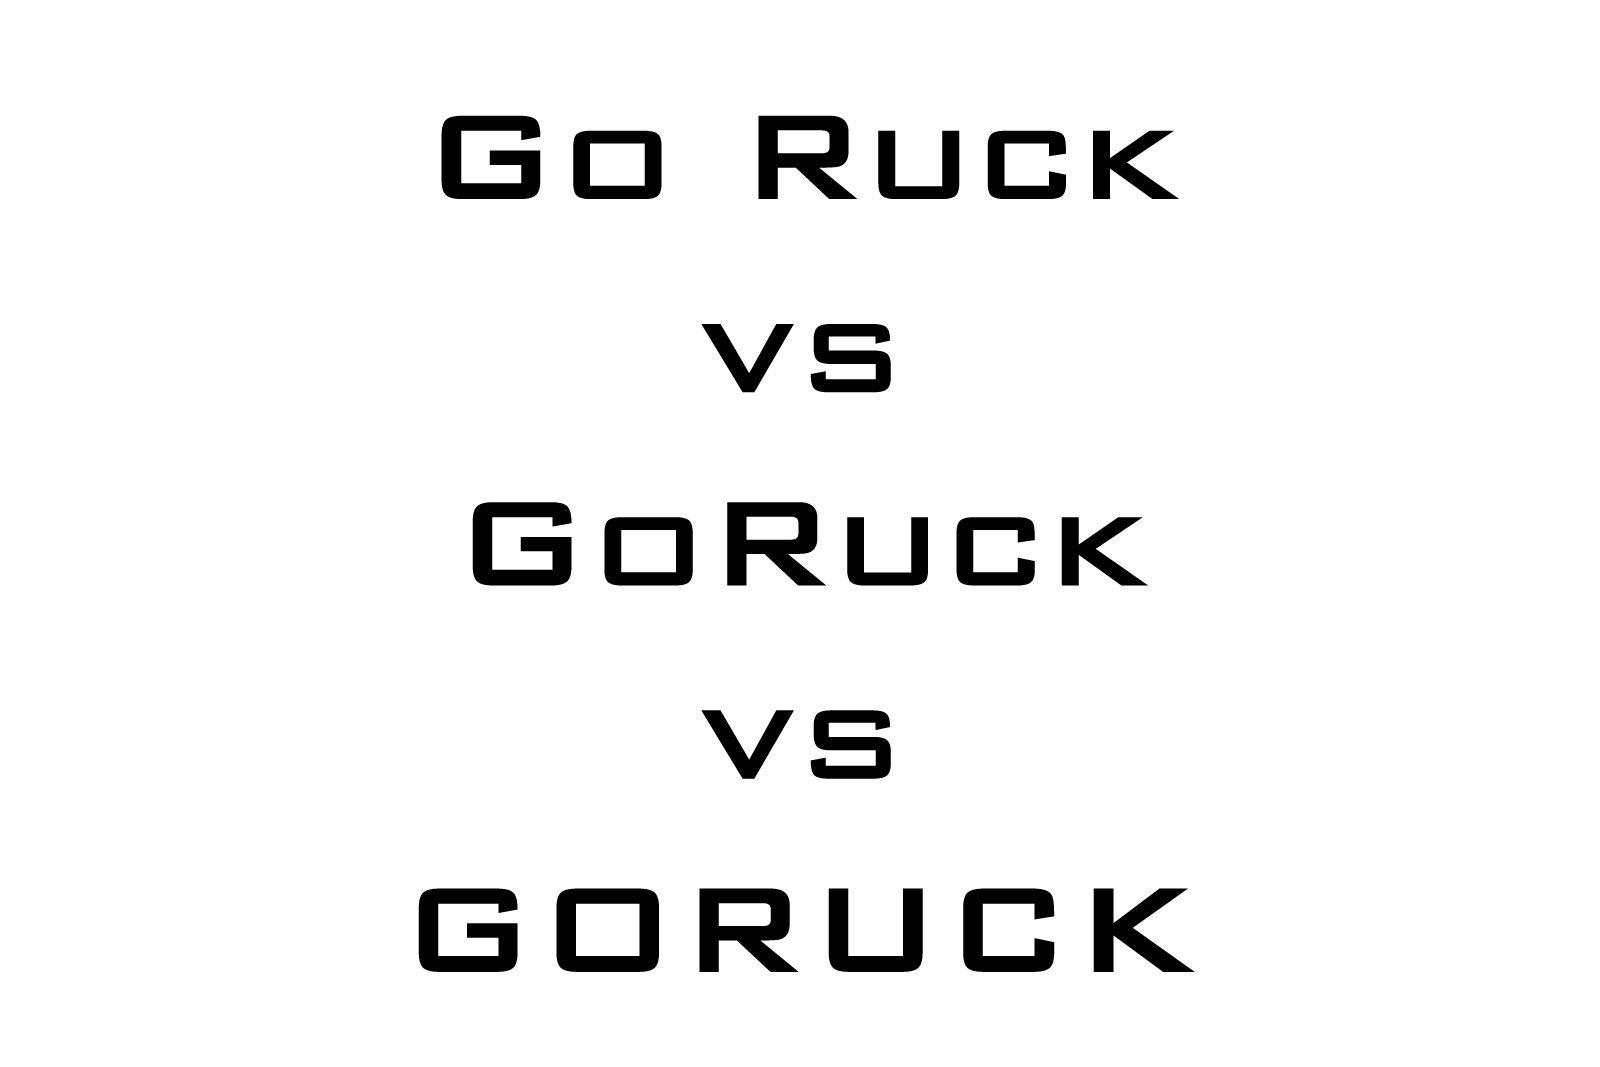 goruck-vs-goruck